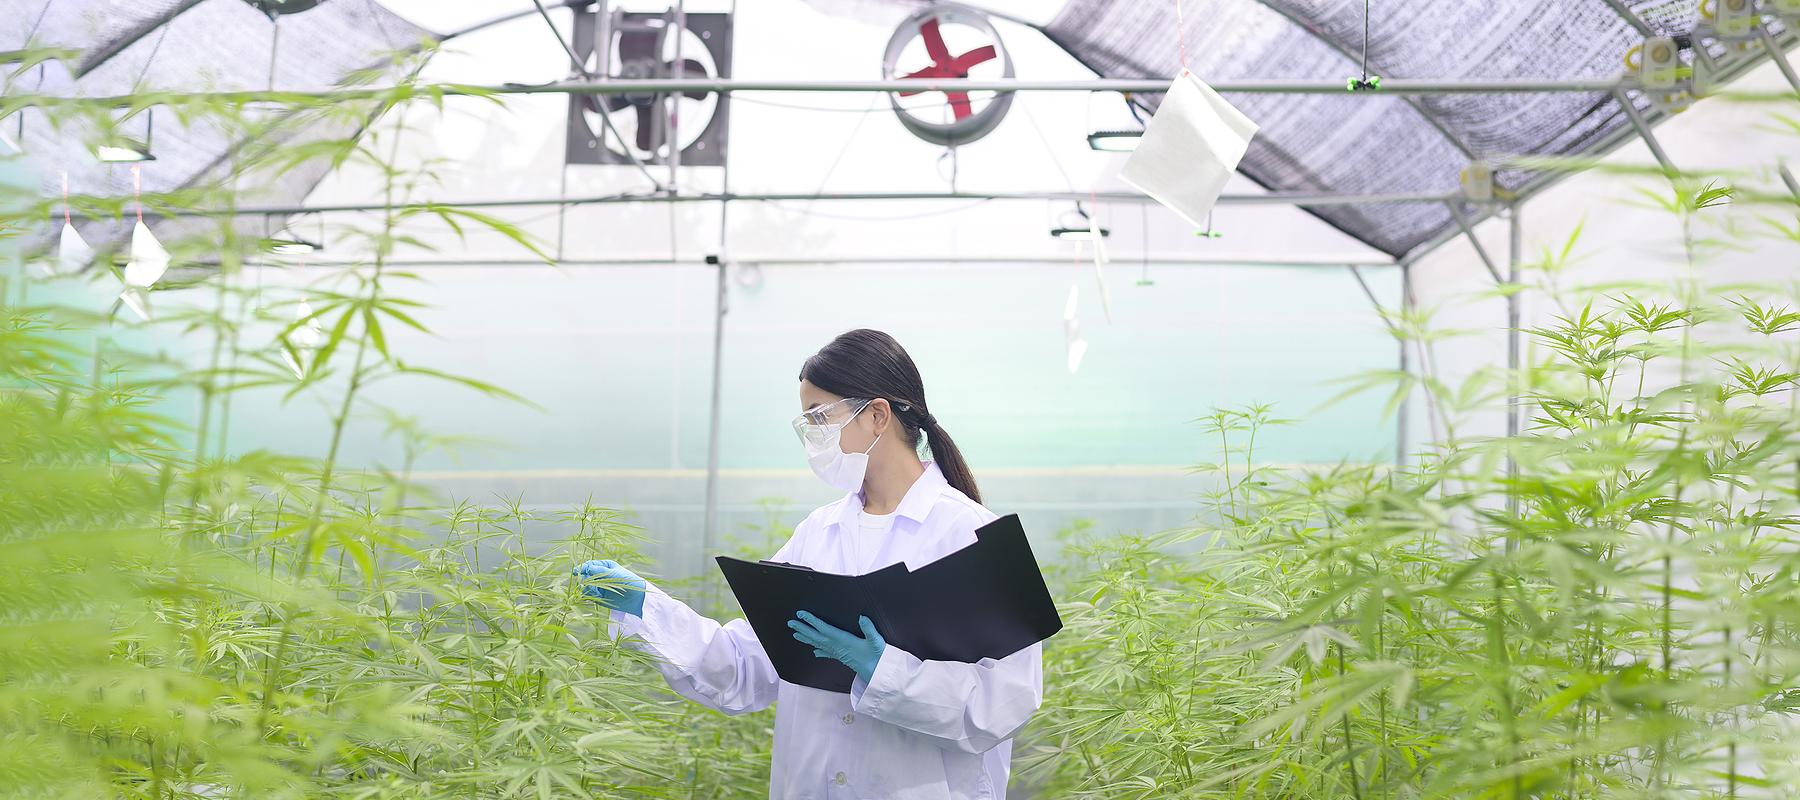 Scientist in lab coat in indoor cannabis growing operation